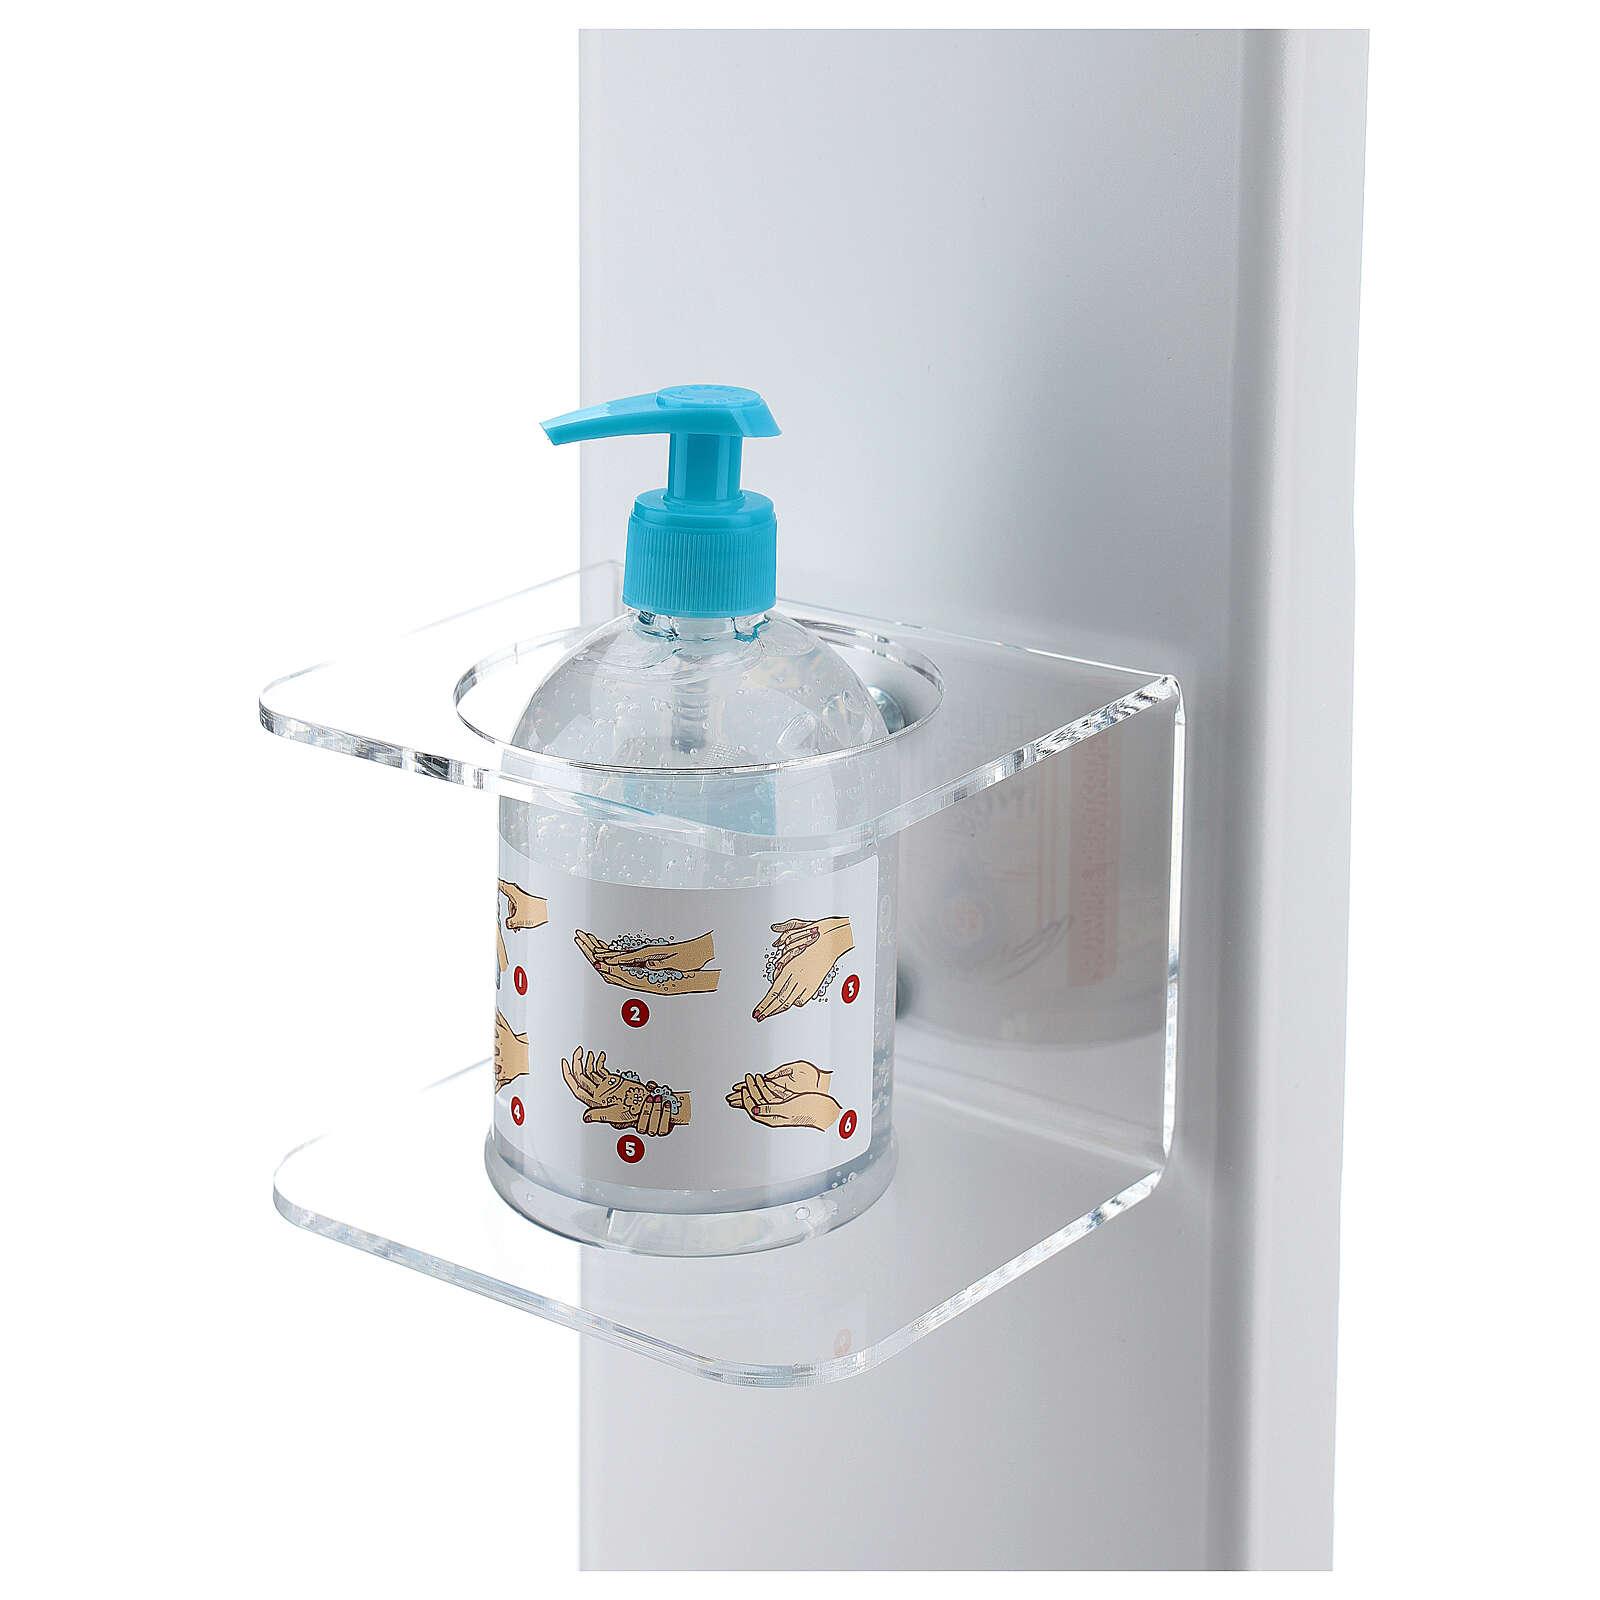 Columna dispensador desinfectante manos con estante guantes y cesto EXTERIOR 3